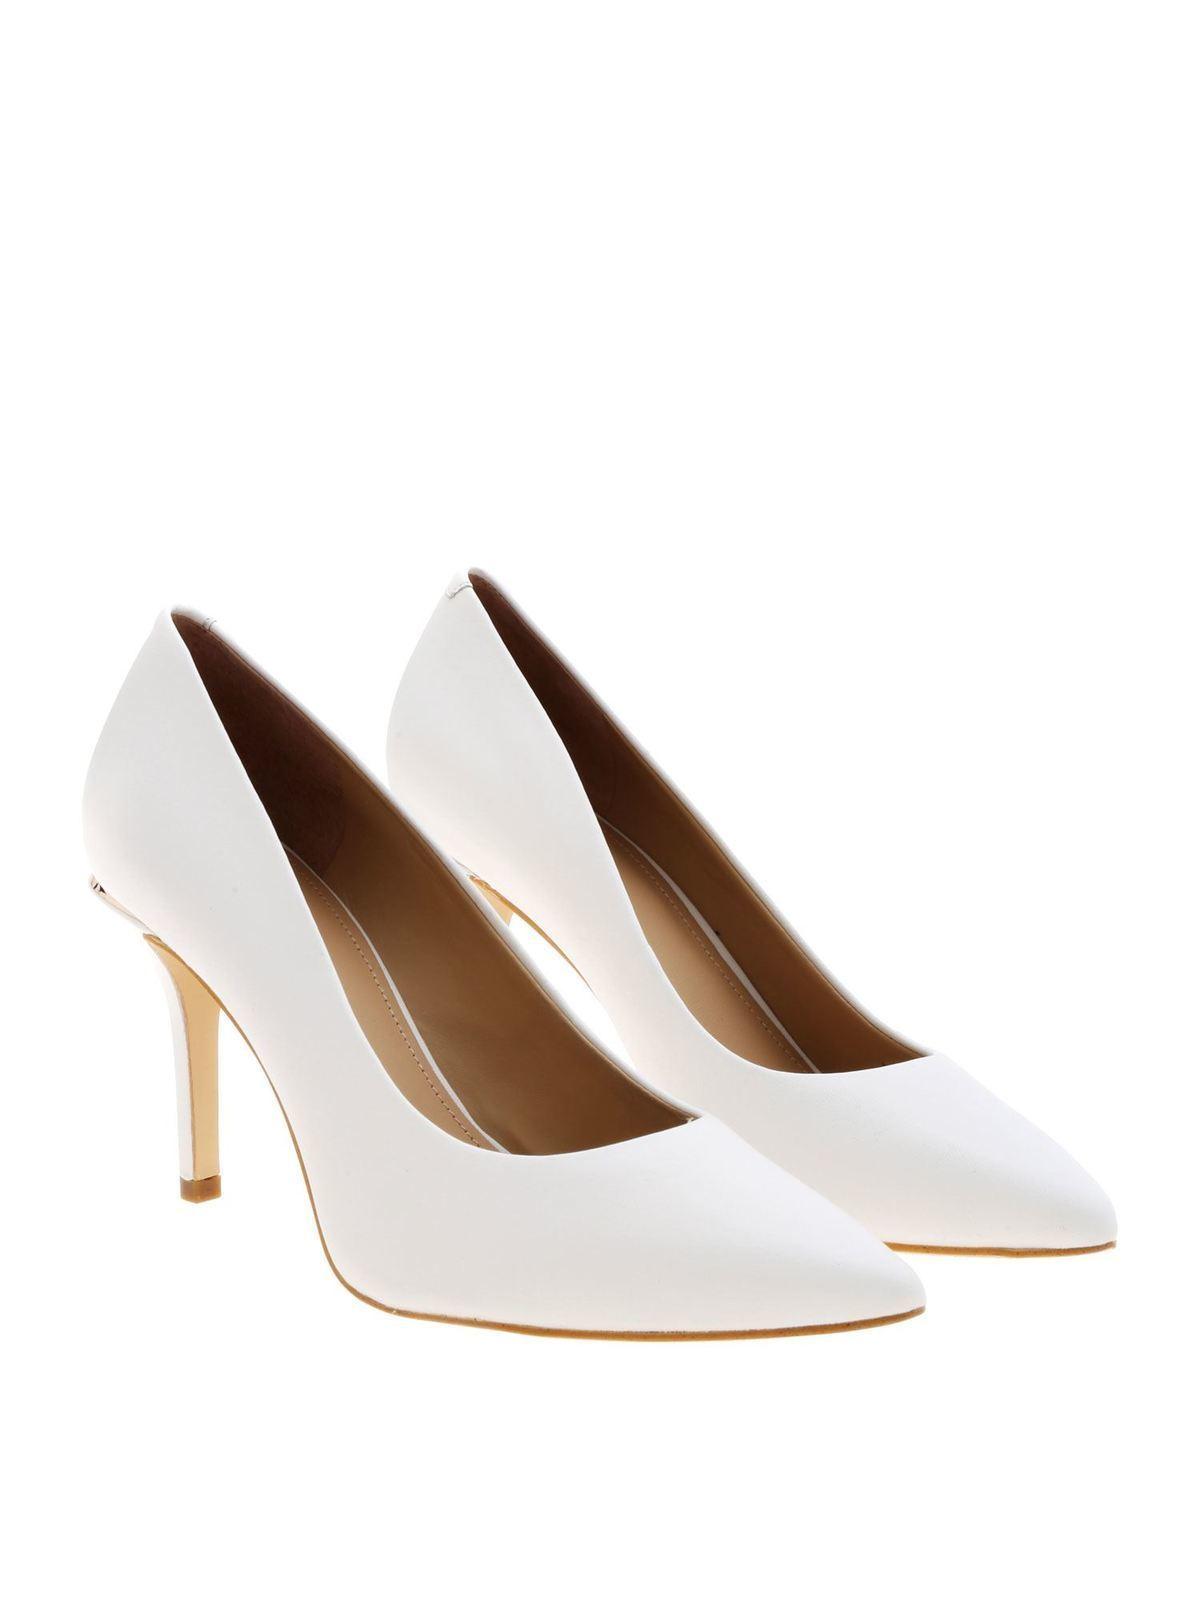 Guess Chaussures À Talon Blanc Escarpins